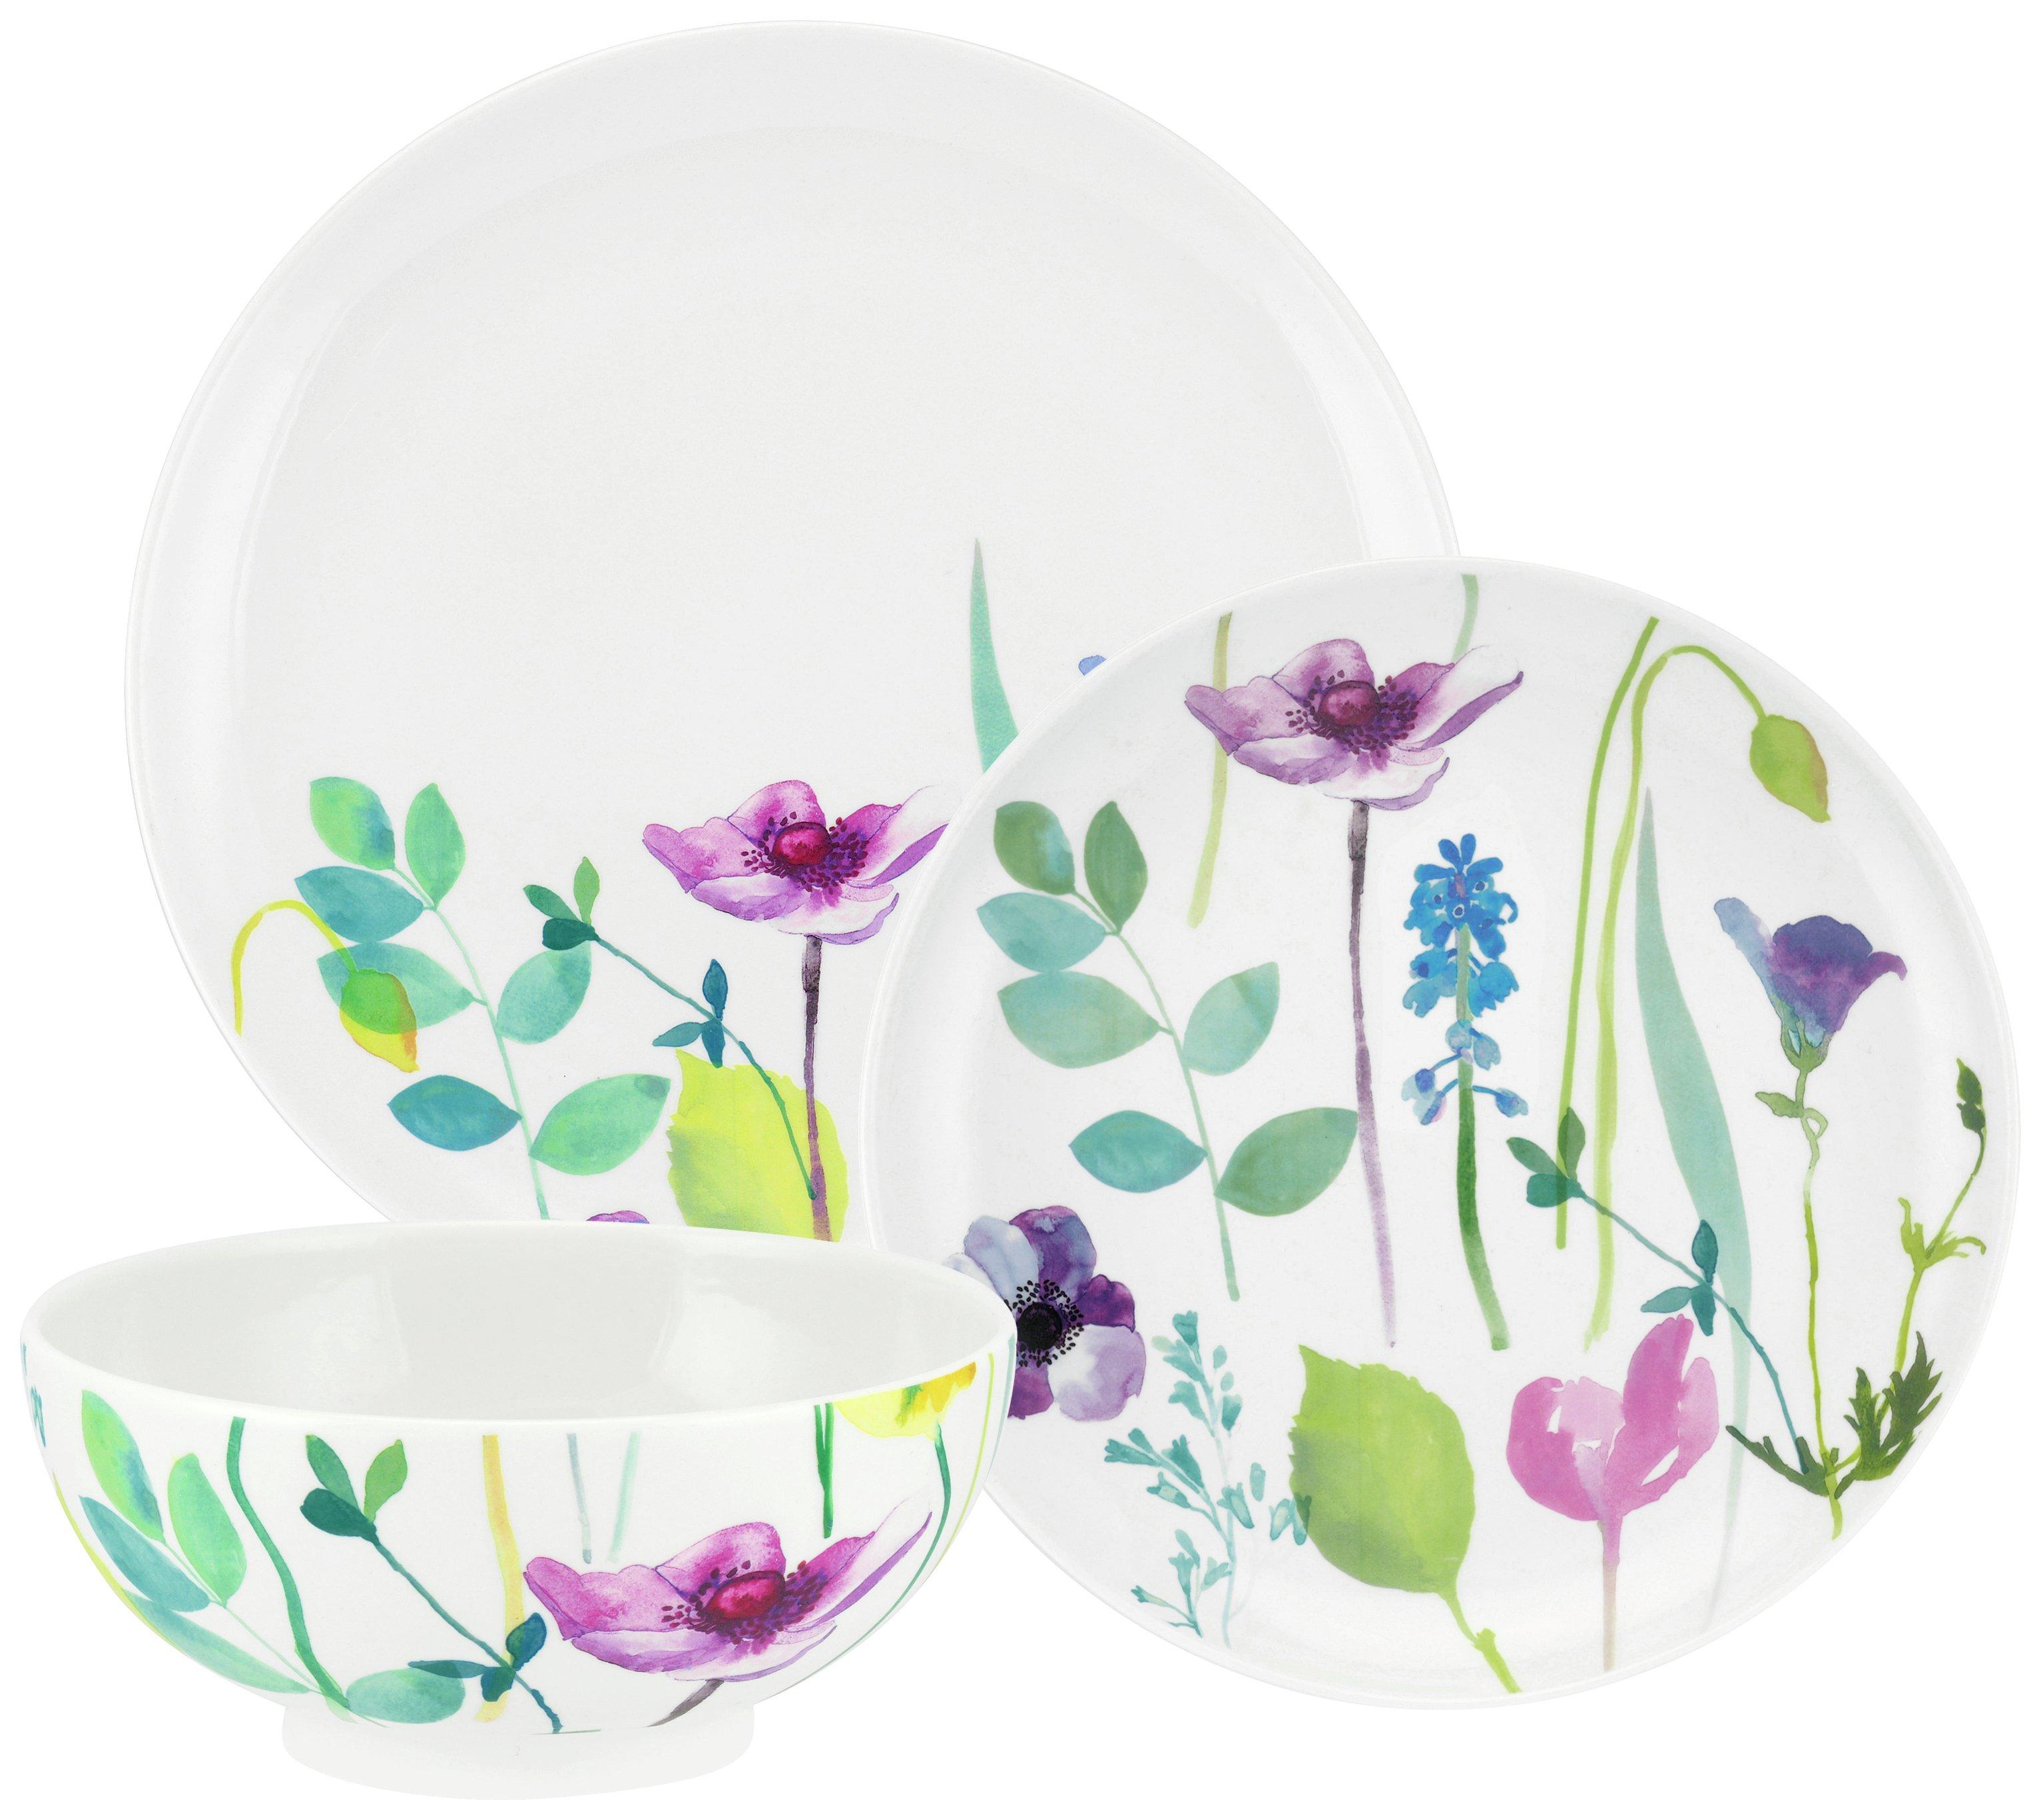 Buy Portmeirion Water Garden 12 Piece Porcelain Dinner Set at